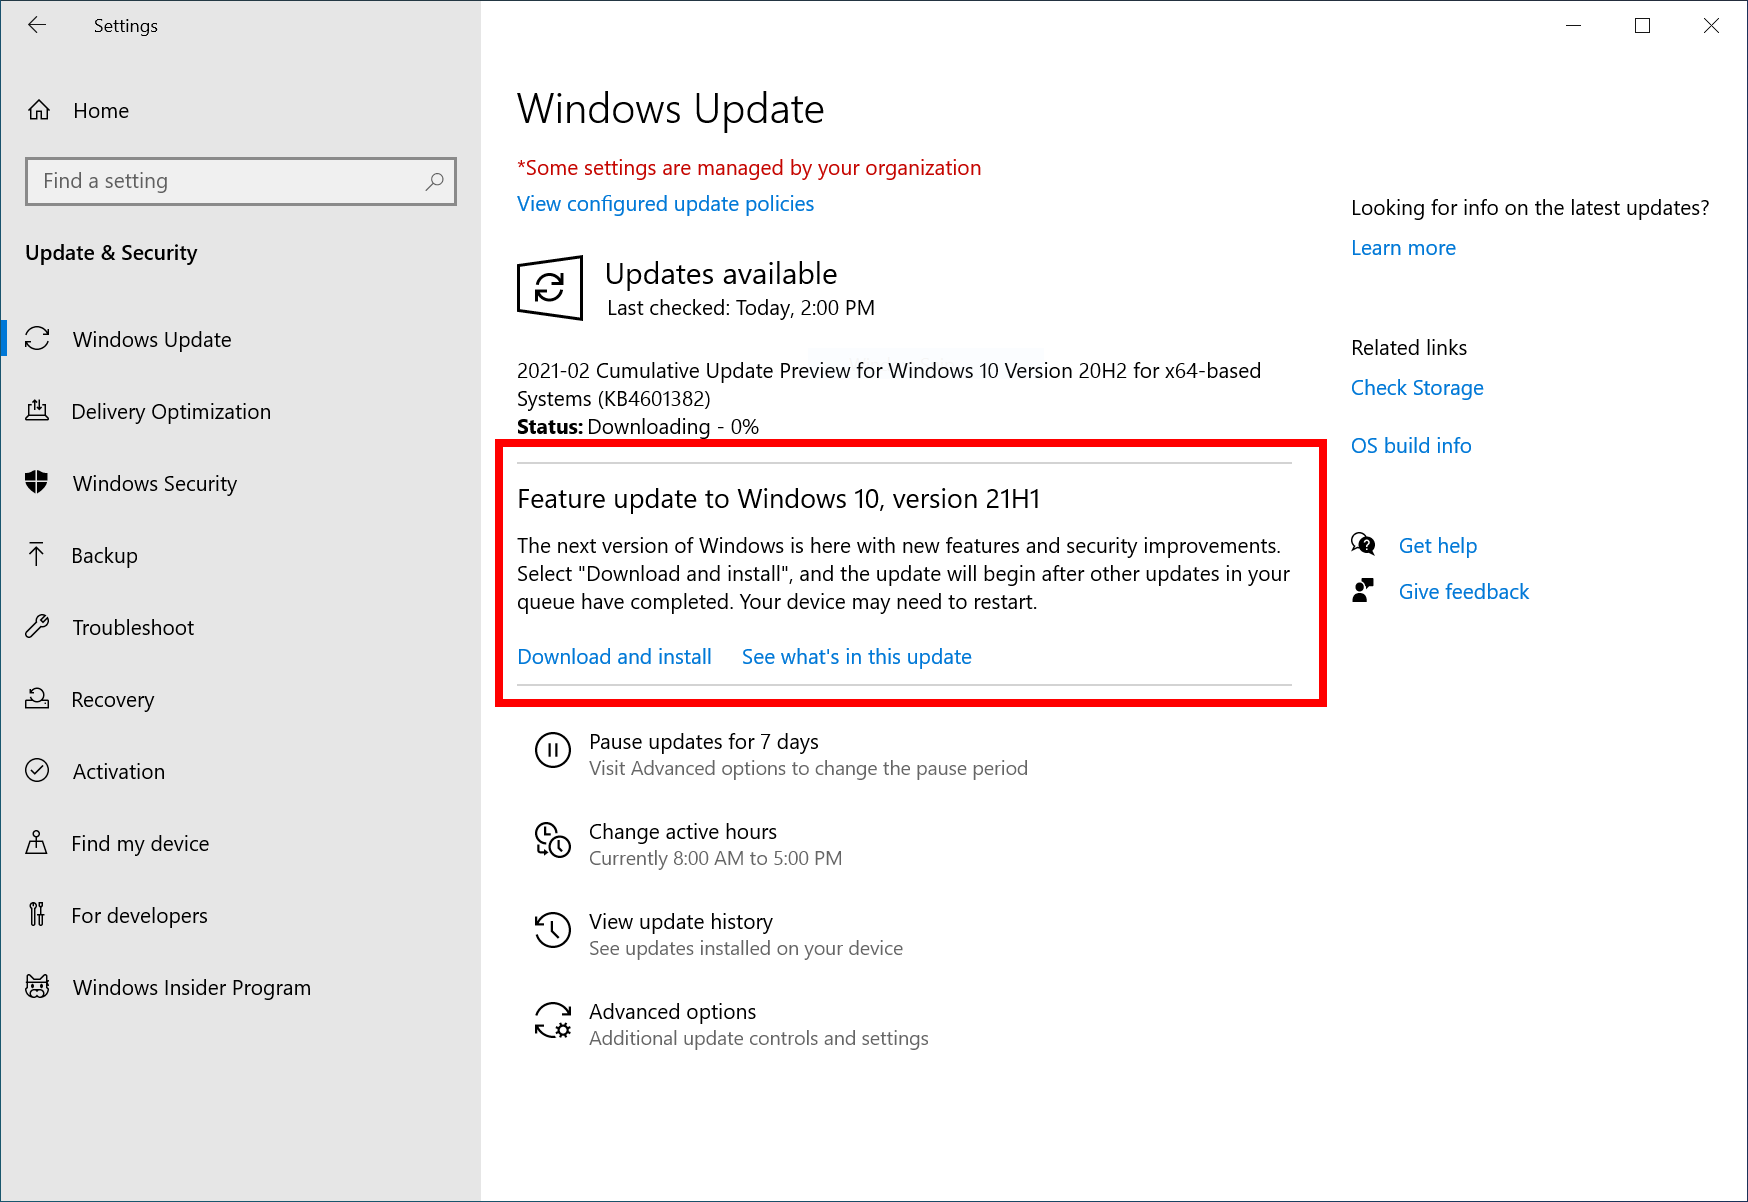 Capture - Windows 10 21H1 Beta (δεν είναι η έκδοση Sun Valley)